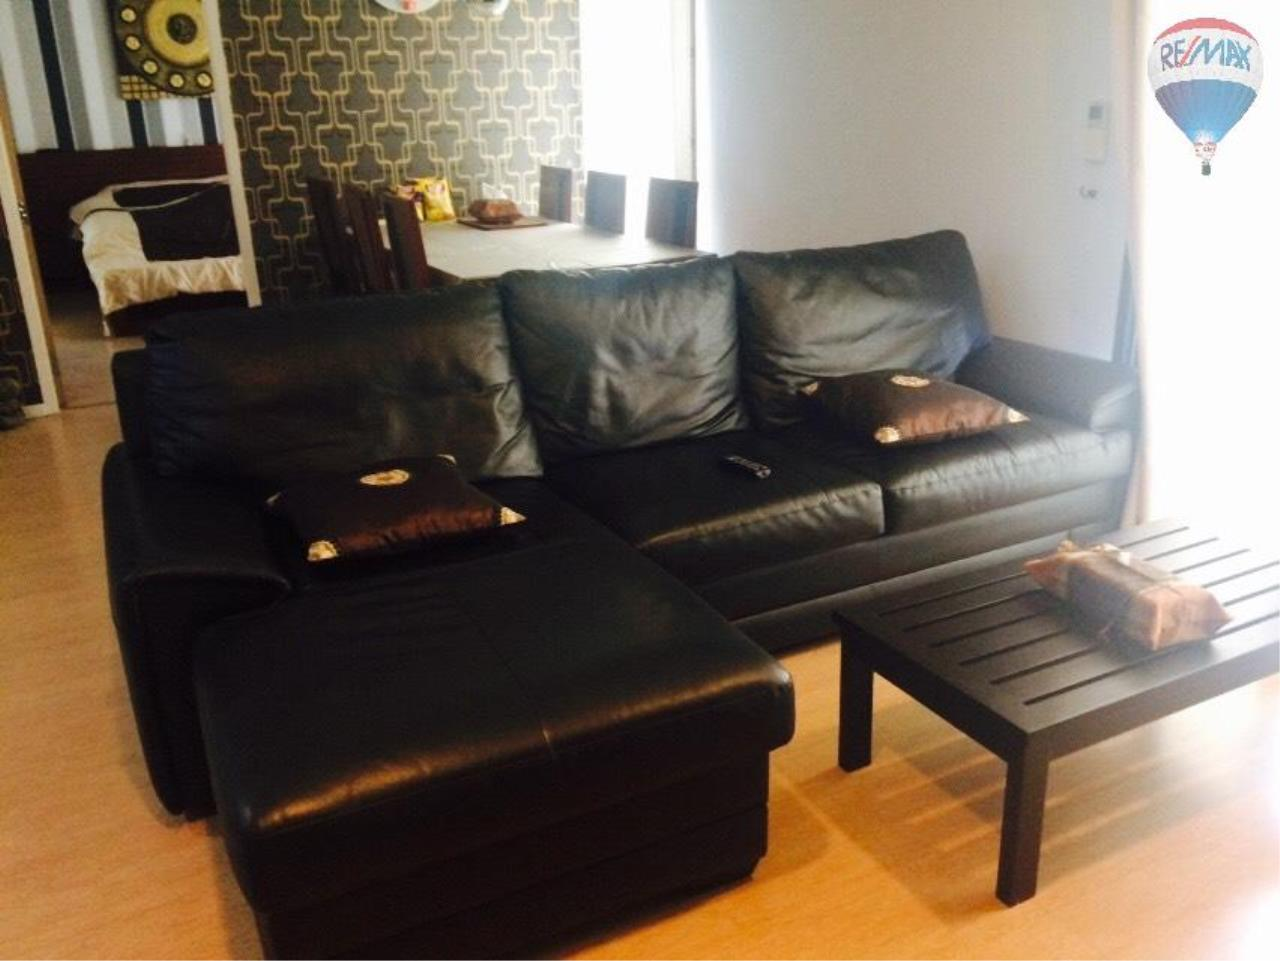 RE/MAX Properties Agency's Condominium for rent 2 bedrooms 92 Sq.m. at Renova Residence 20